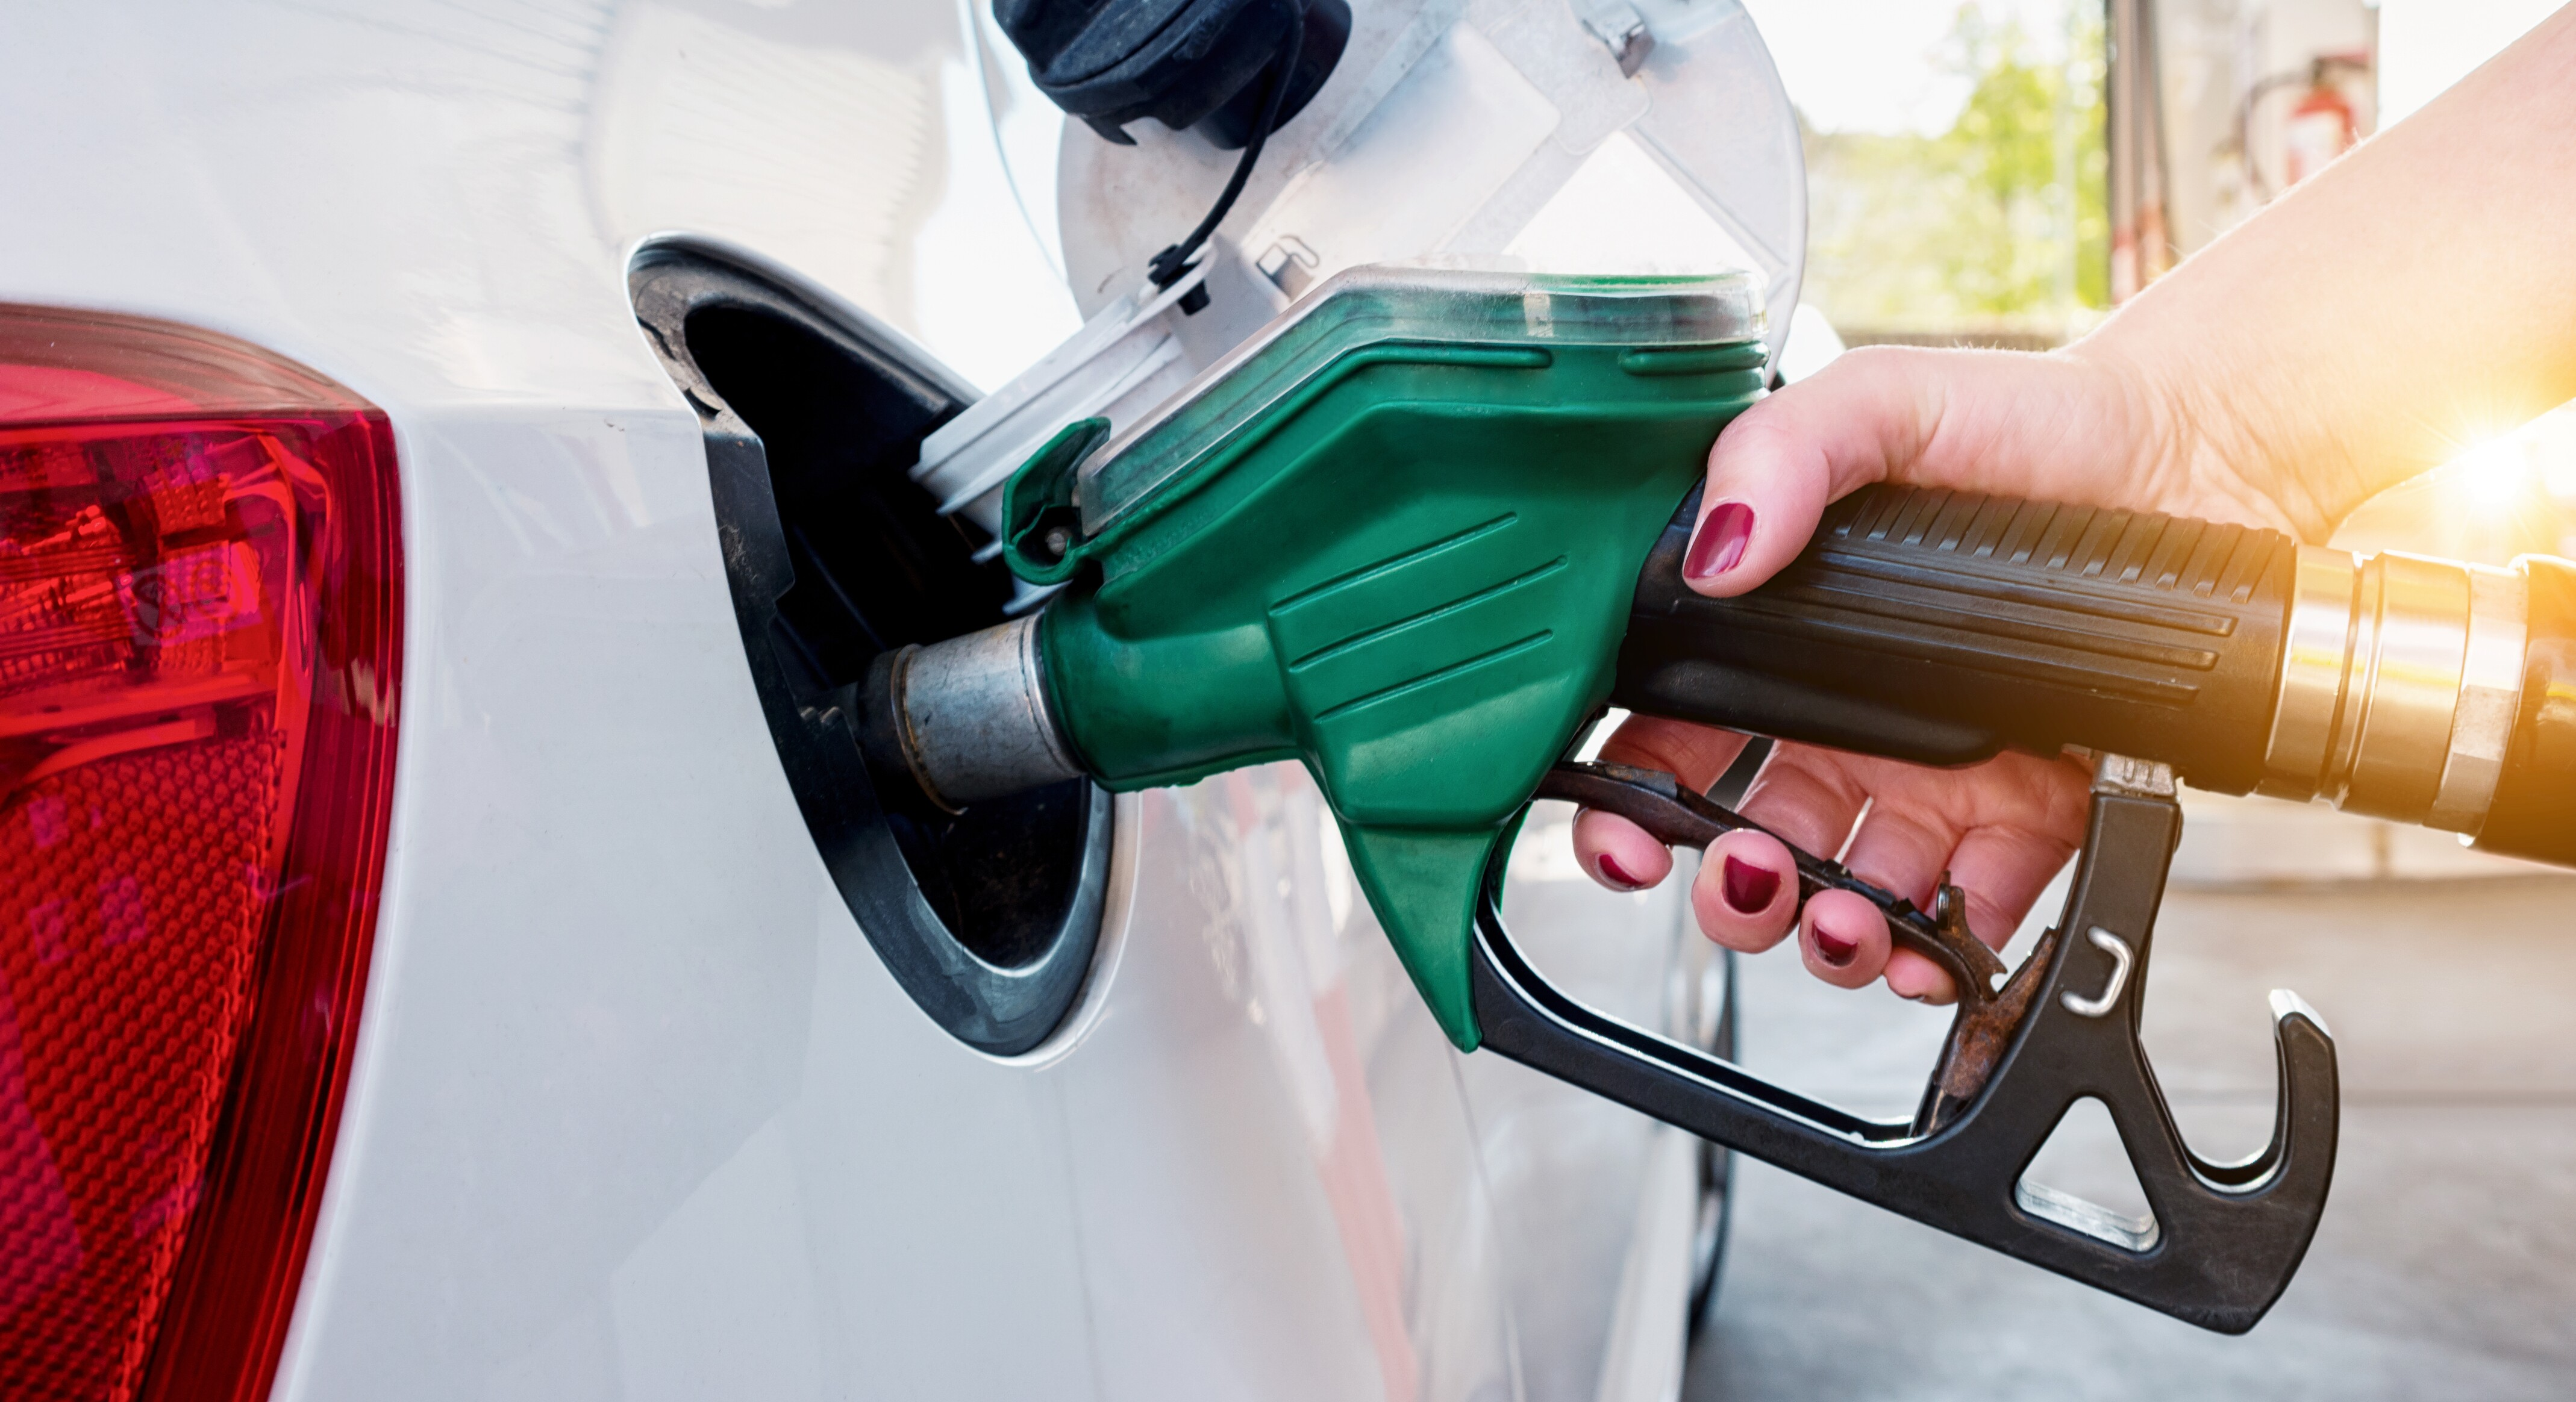 Trump finally reaches ethanol deal, but questions linger